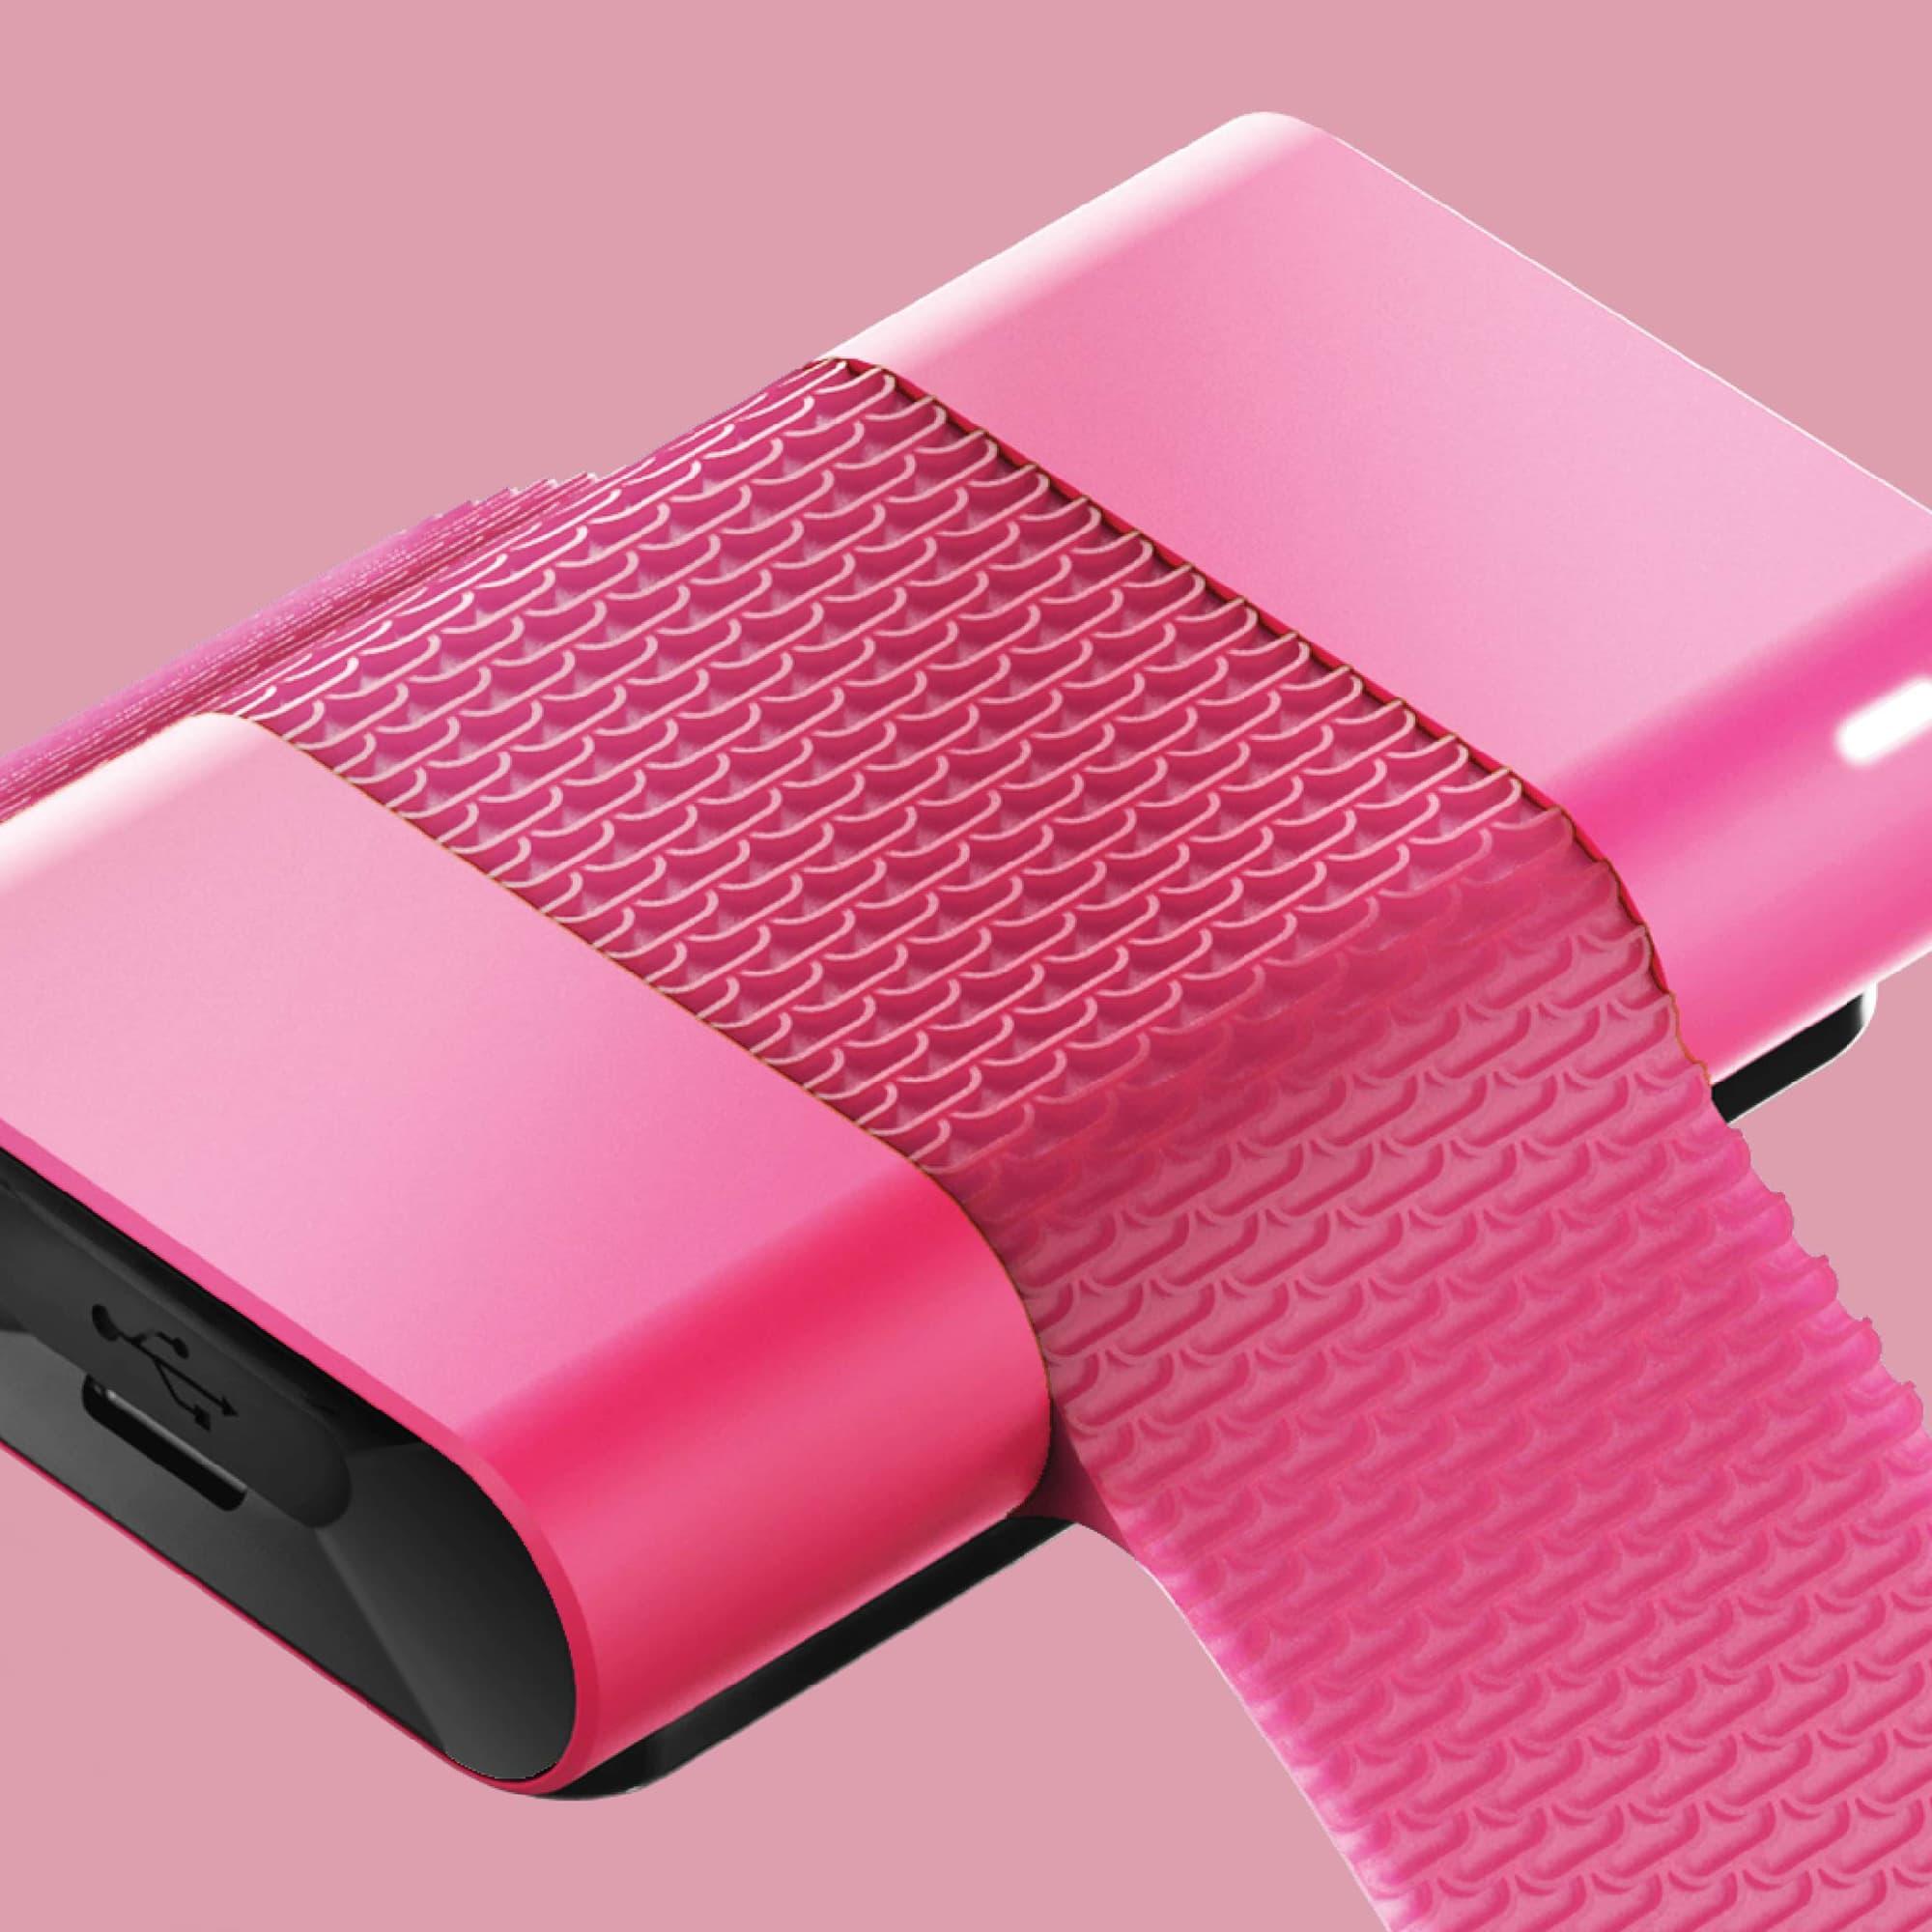 STUCK_Planexta_ECG_Senceband_Pink_Square_Cover_Compressed